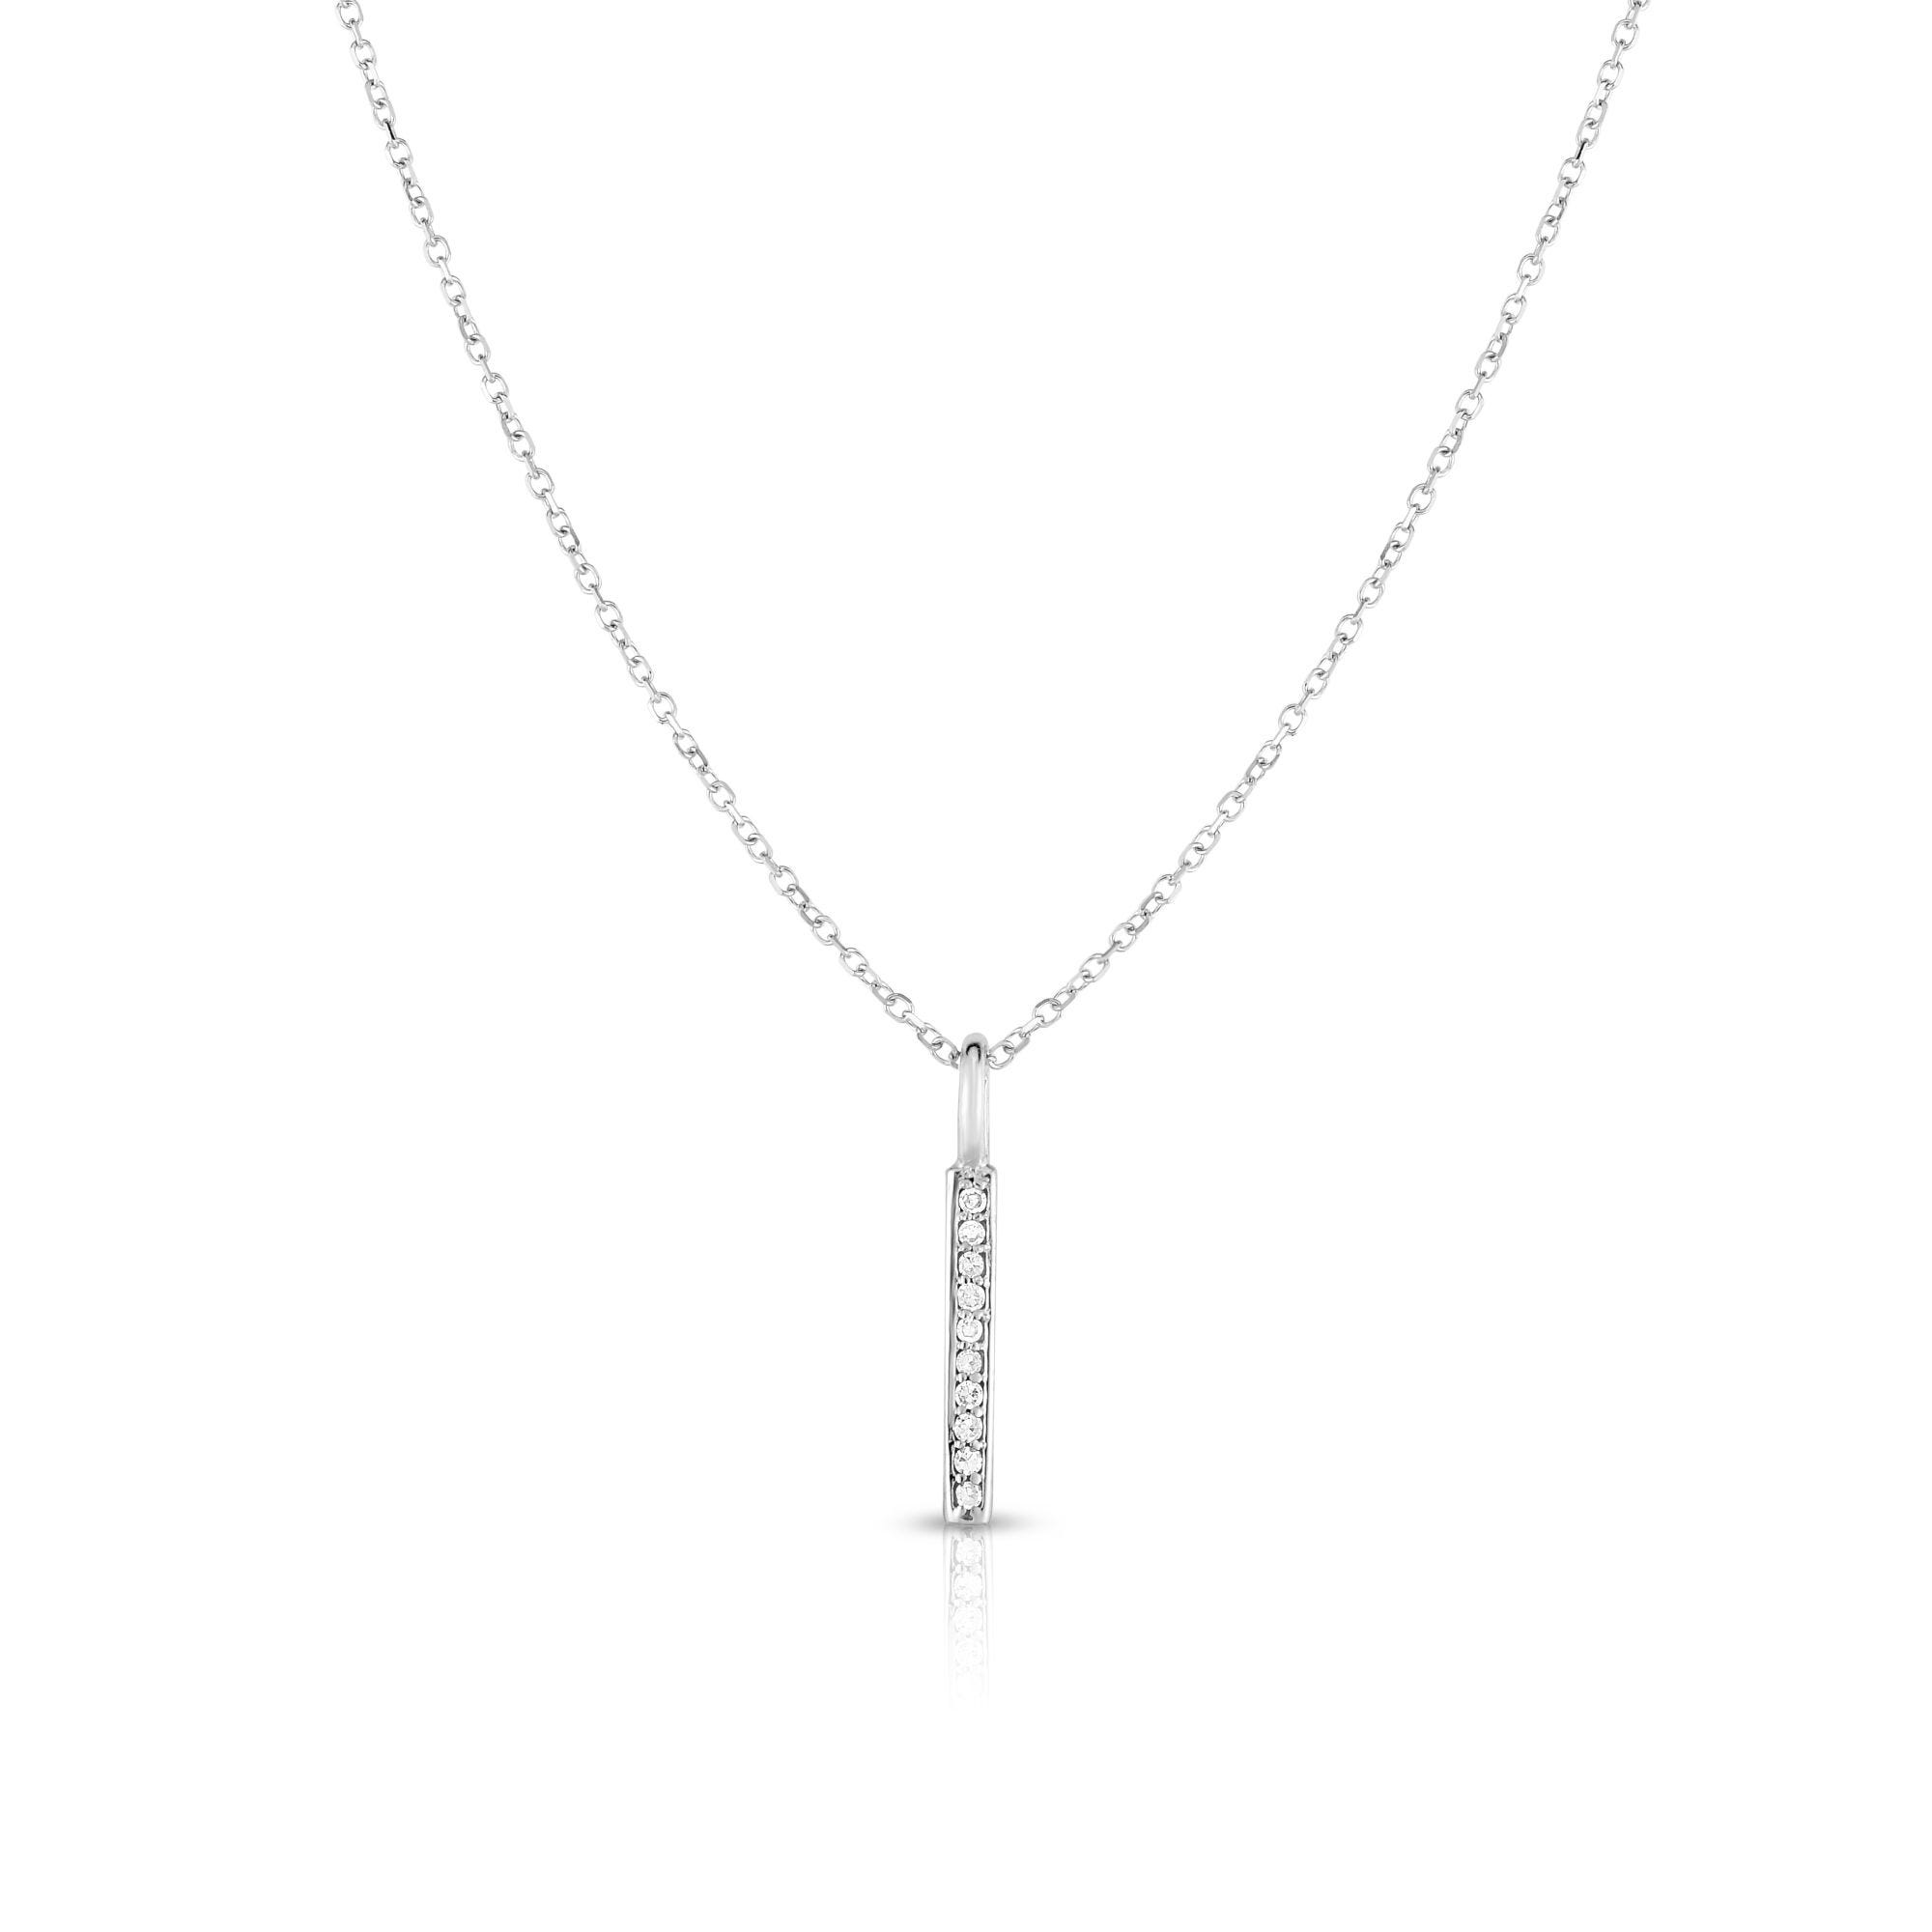 Diamond Vertical Bar Necklace in 14k White Gold